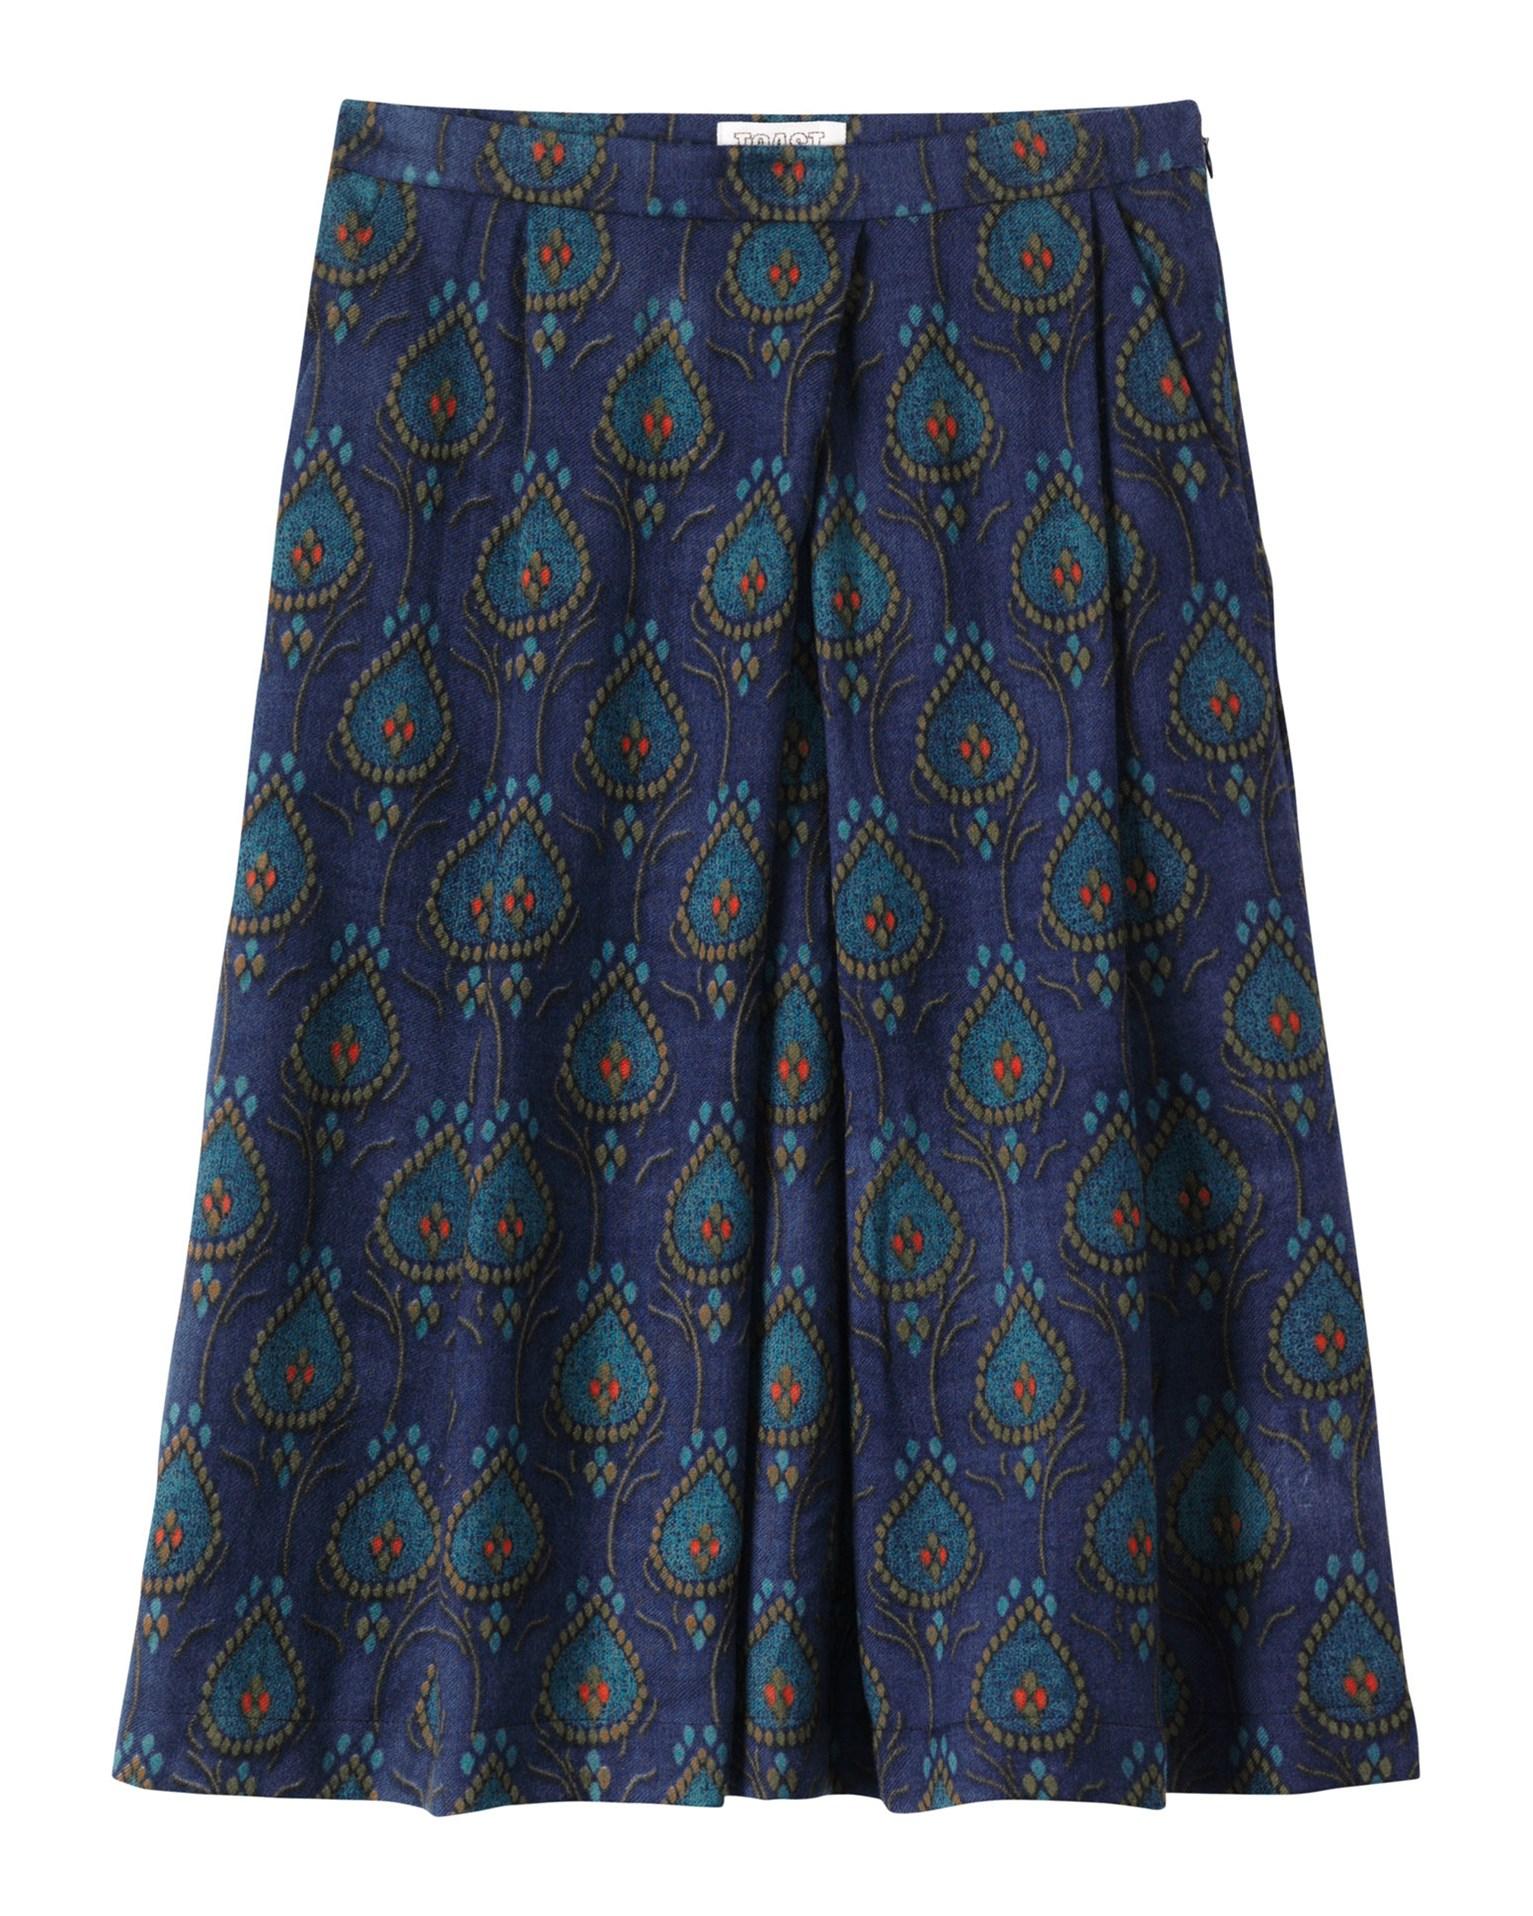 toast block print skirt in blue midnight olive kingfisher